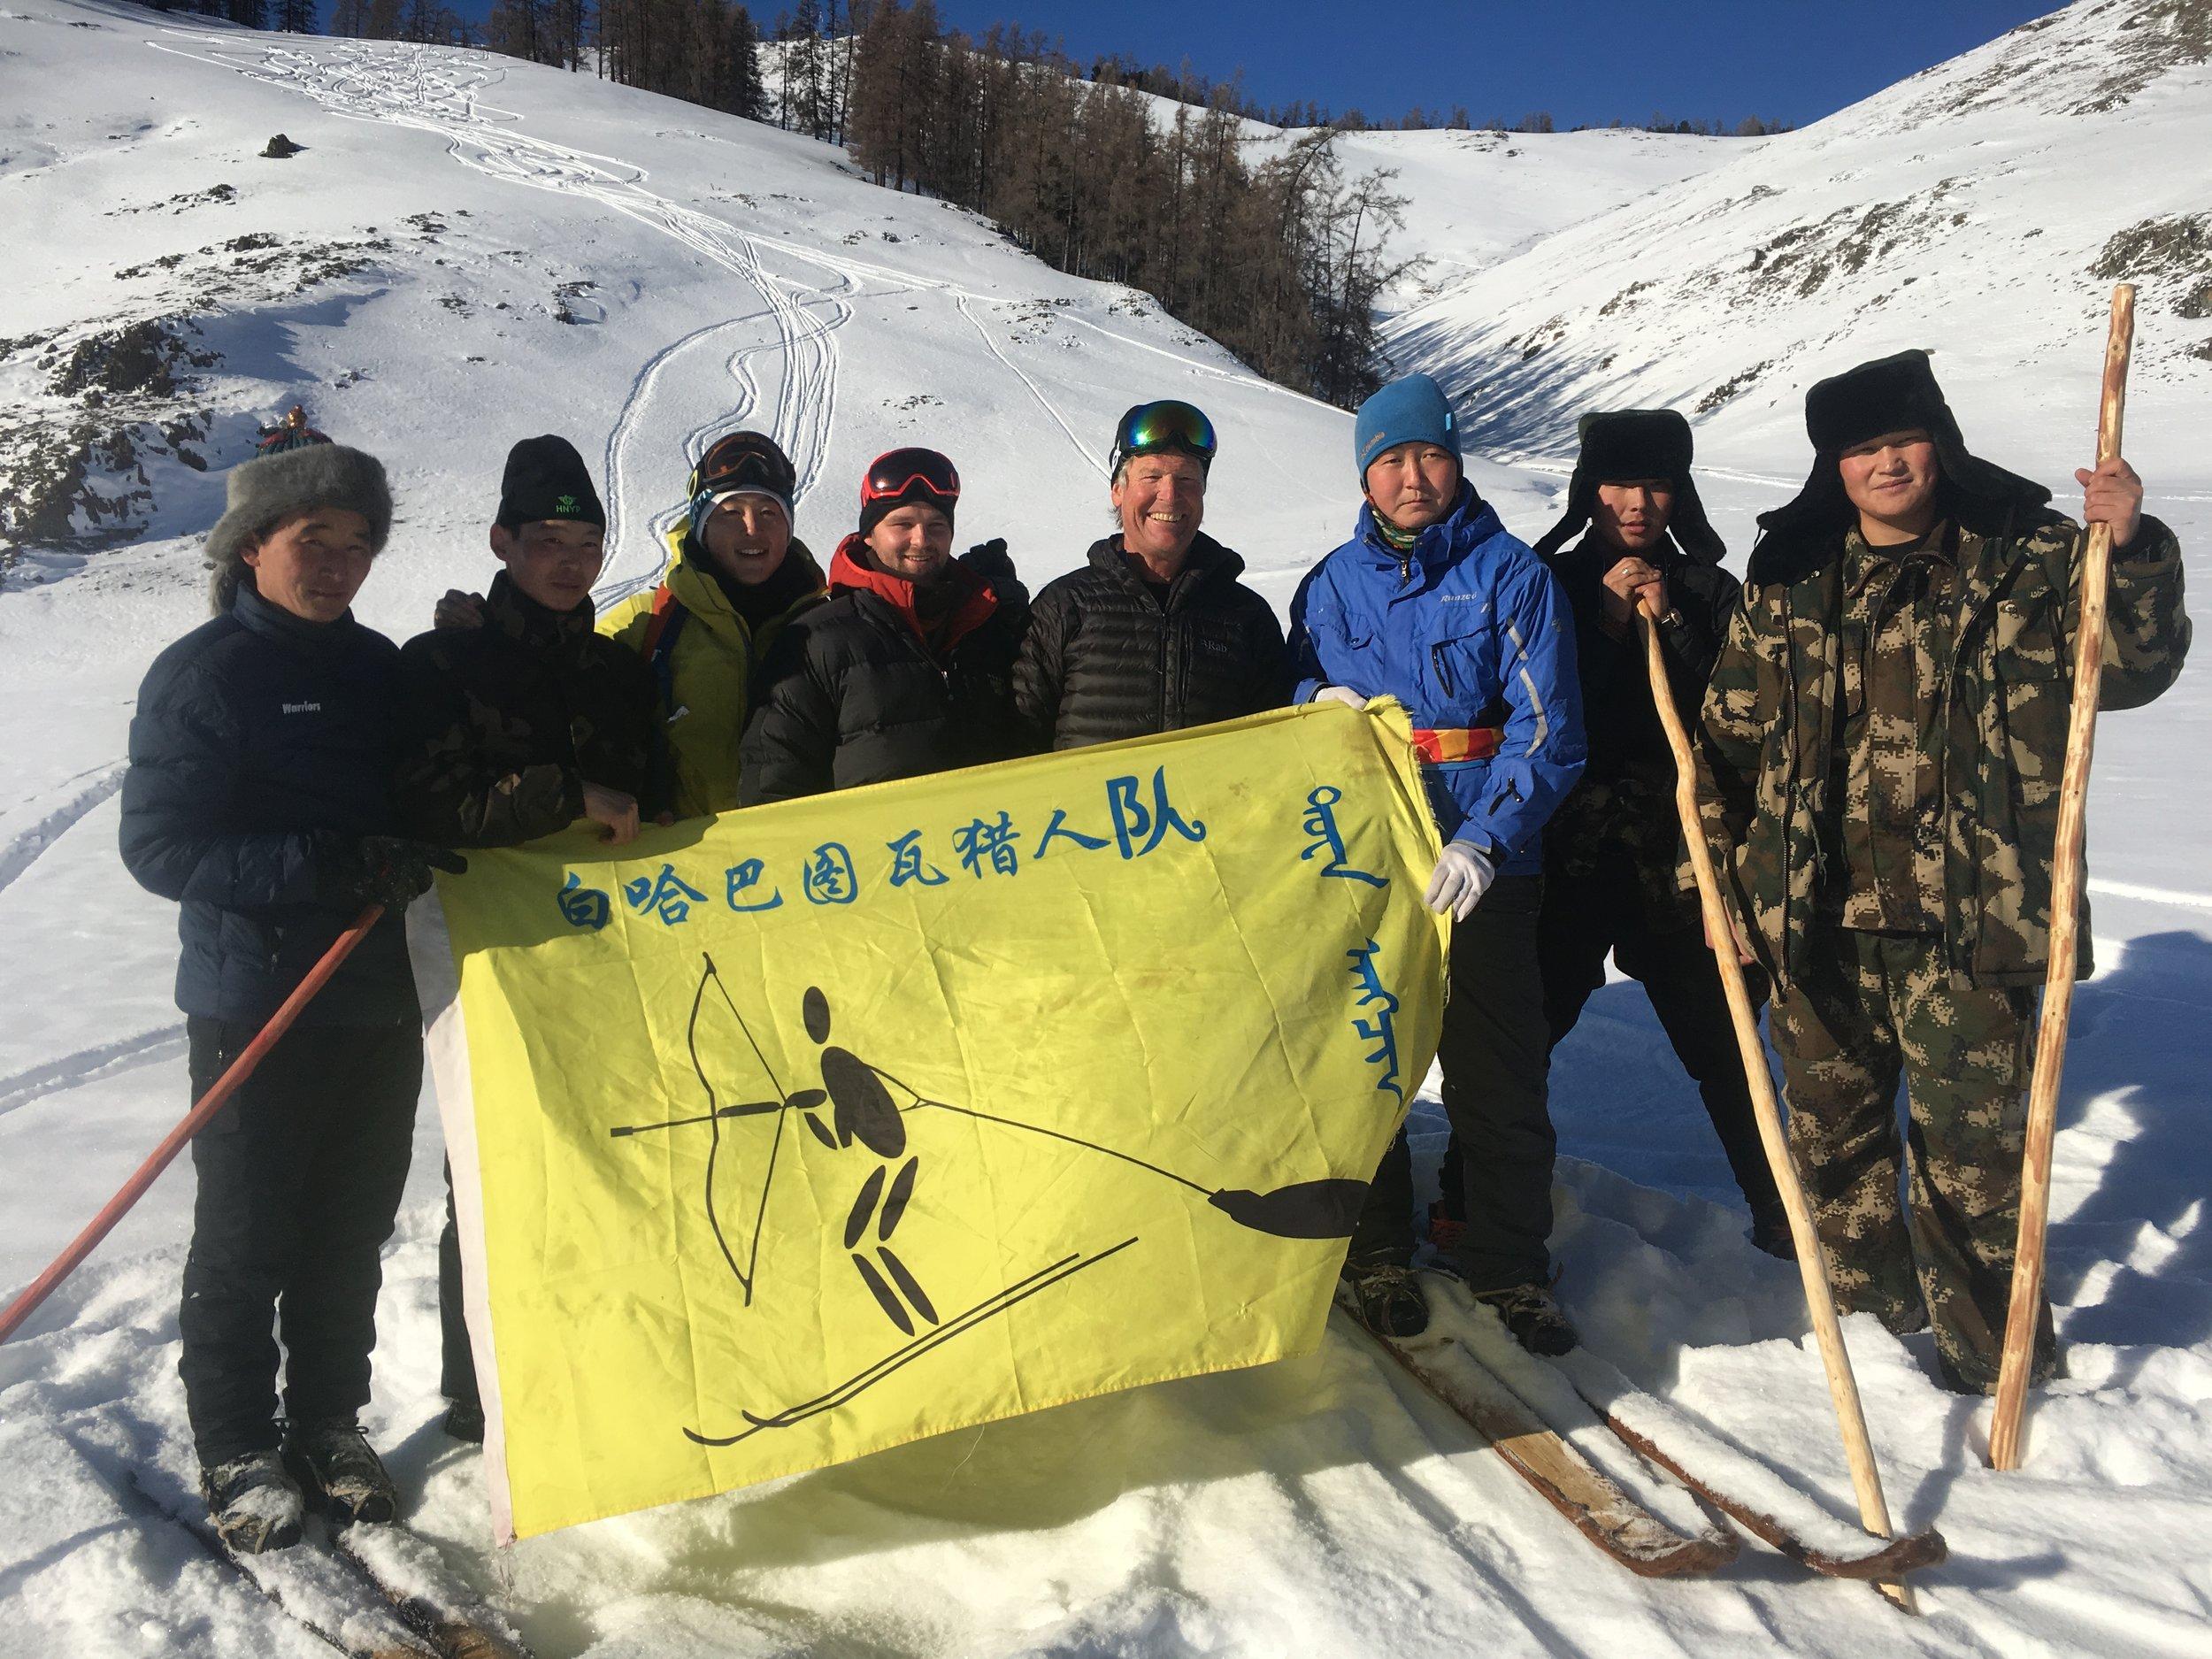 Traditional ski culture